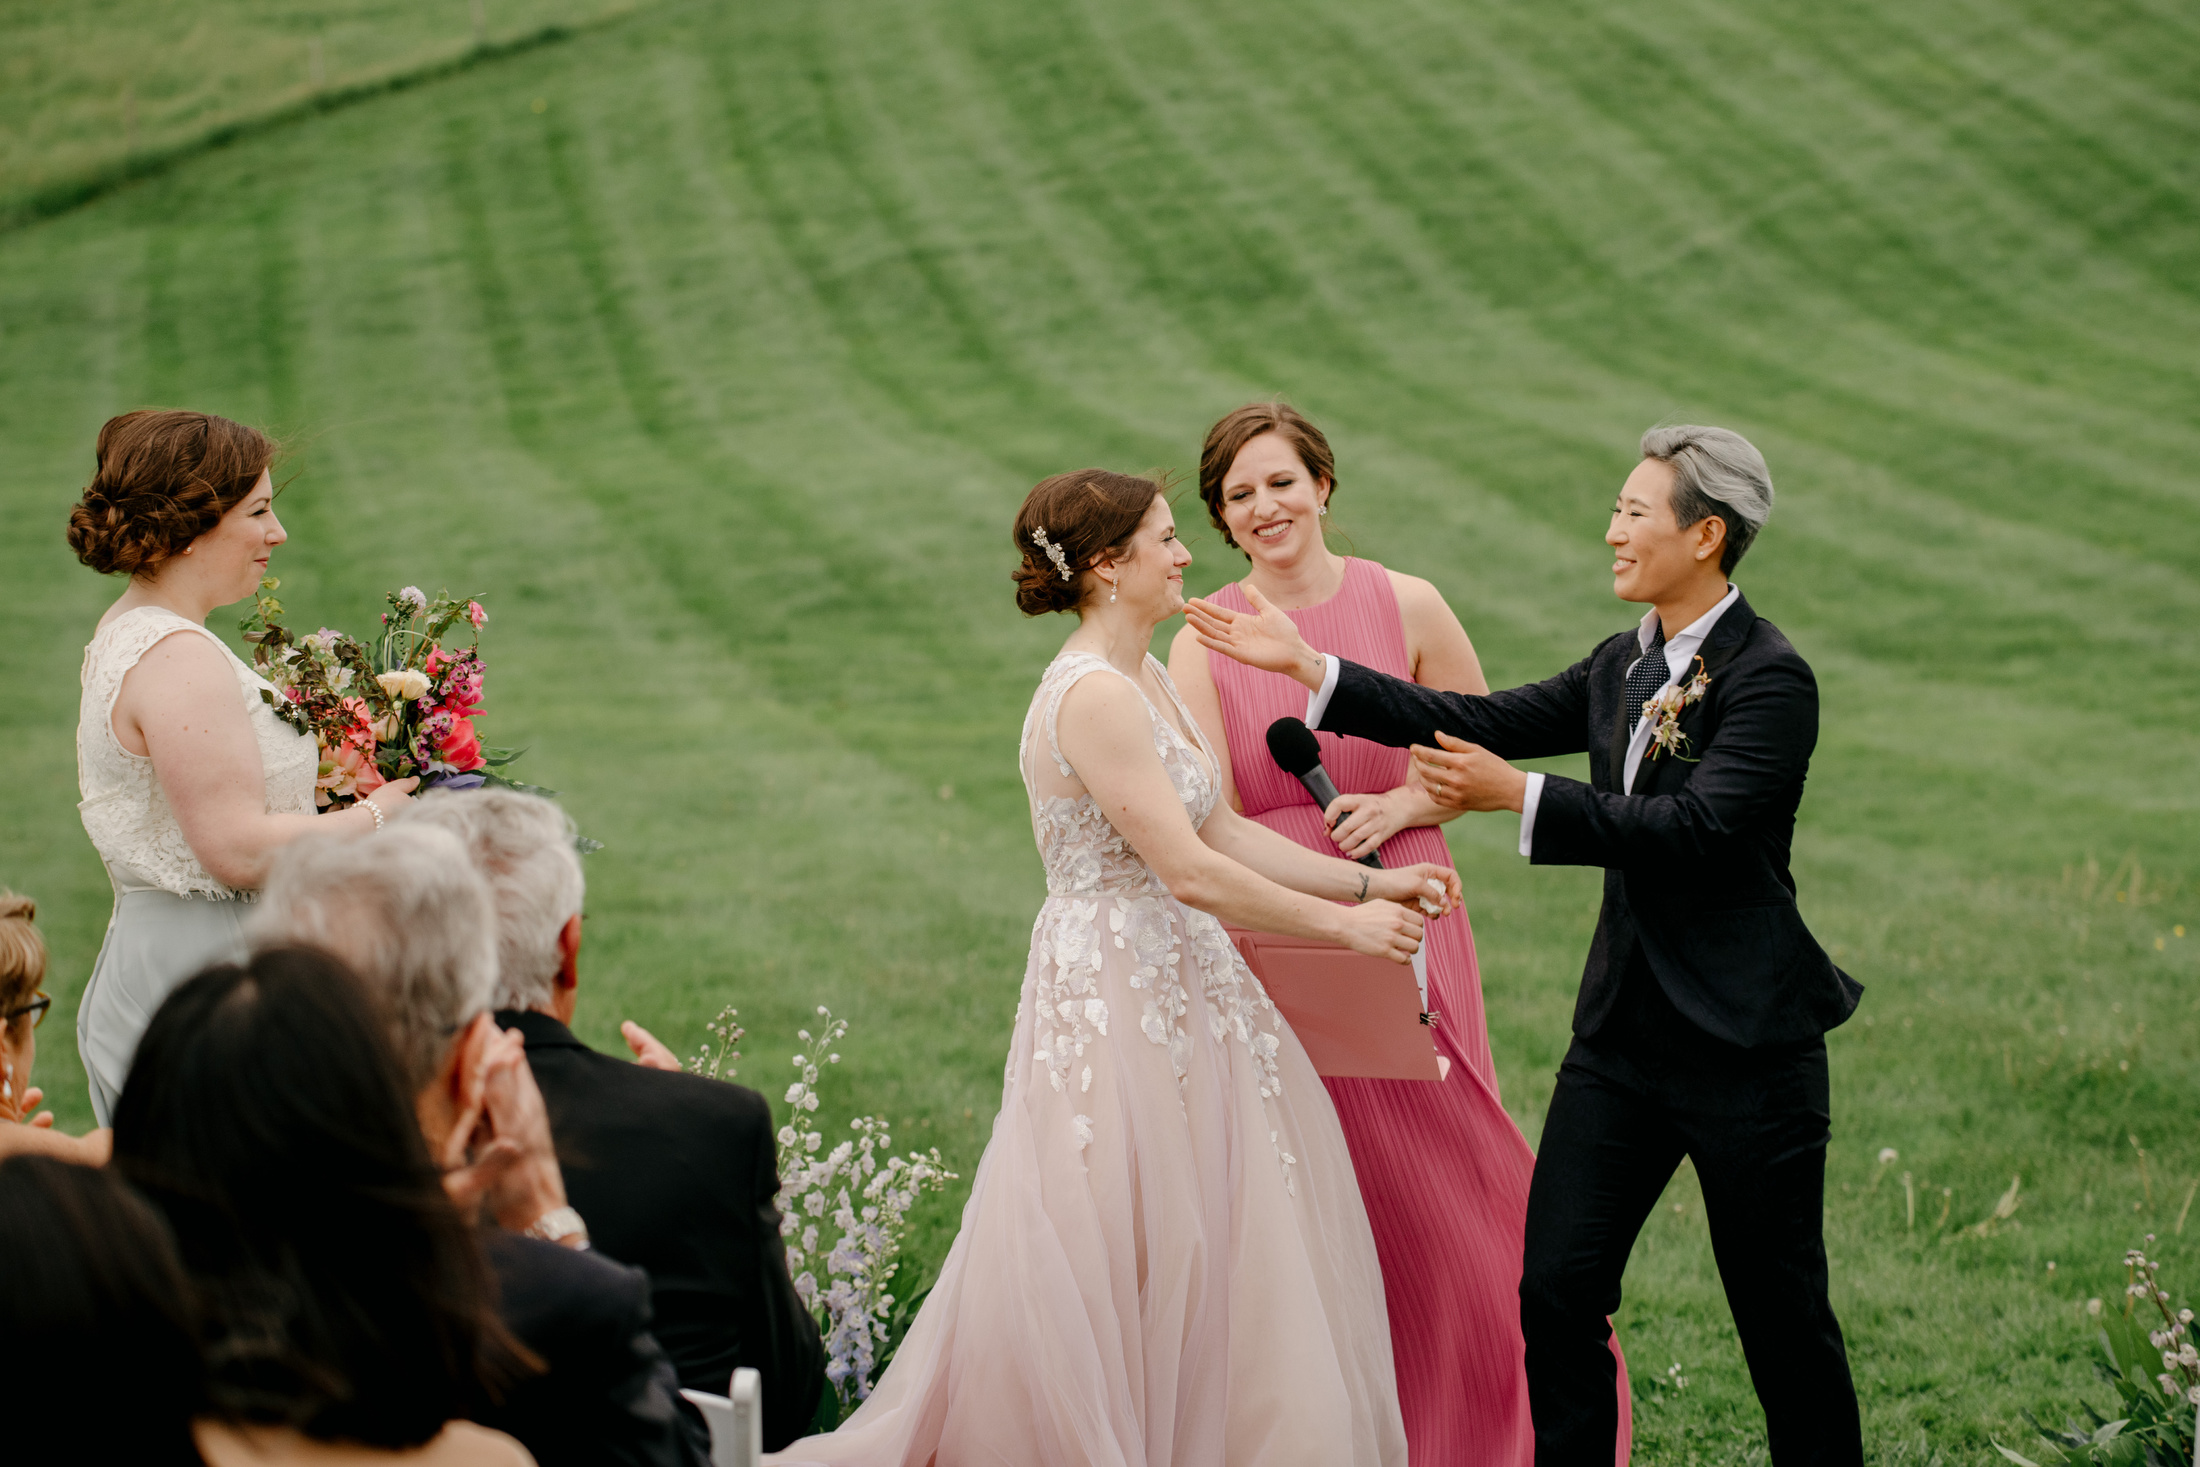 gibbet_hill_barn_same_sex_wedding_photos_46.JPG